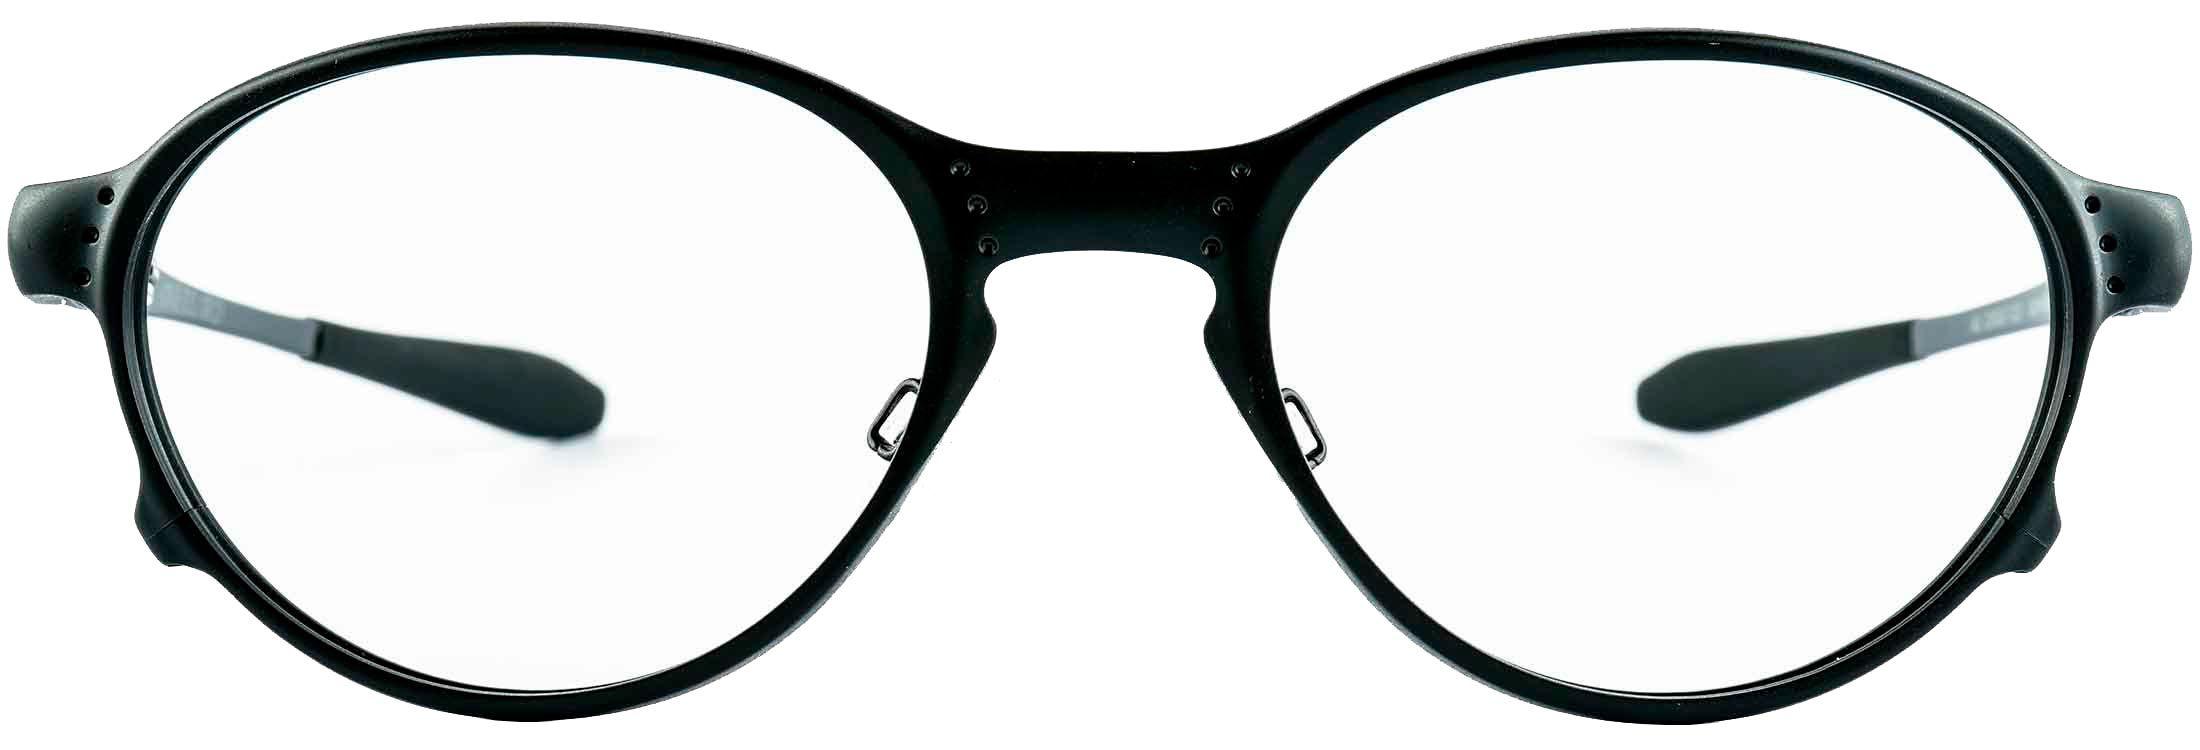 6dc294b59d Oakley Overlord eyeglasses